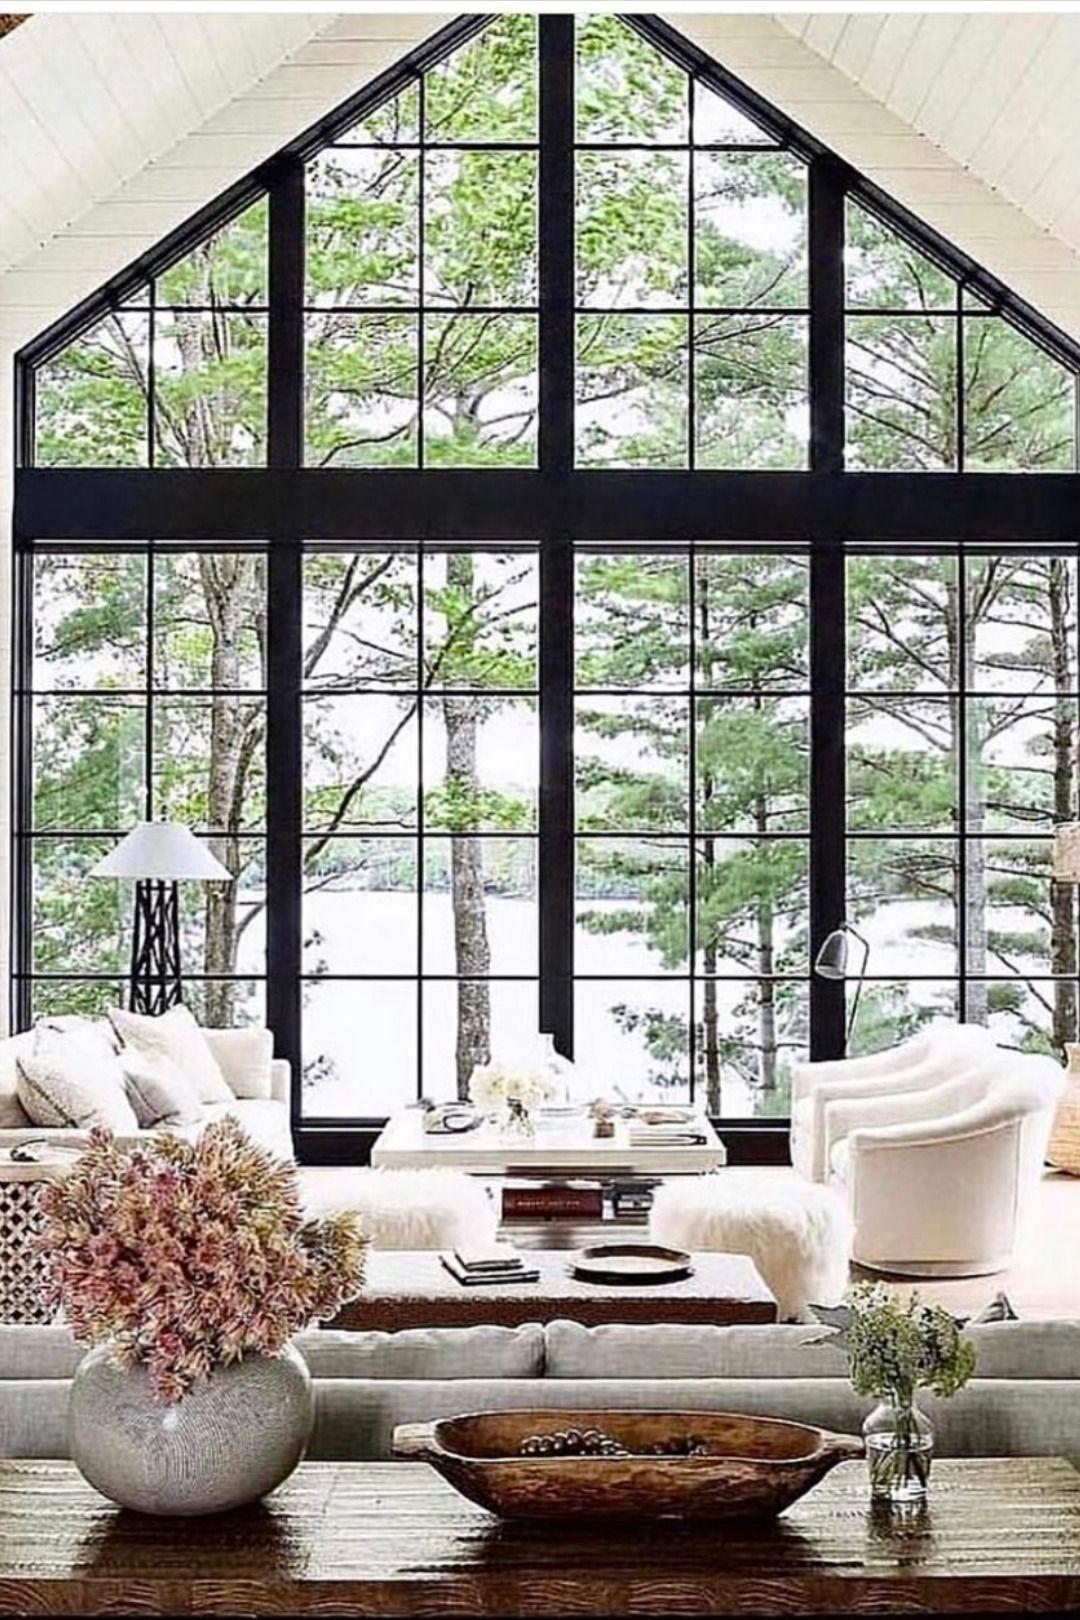 Denver Interior Designers A Top 20 To Inspire Wonderful Designs In 2021 Farmhouse Interior Design Modern Farmhouse Interior Design Modern Farmhouse Living Room Decor